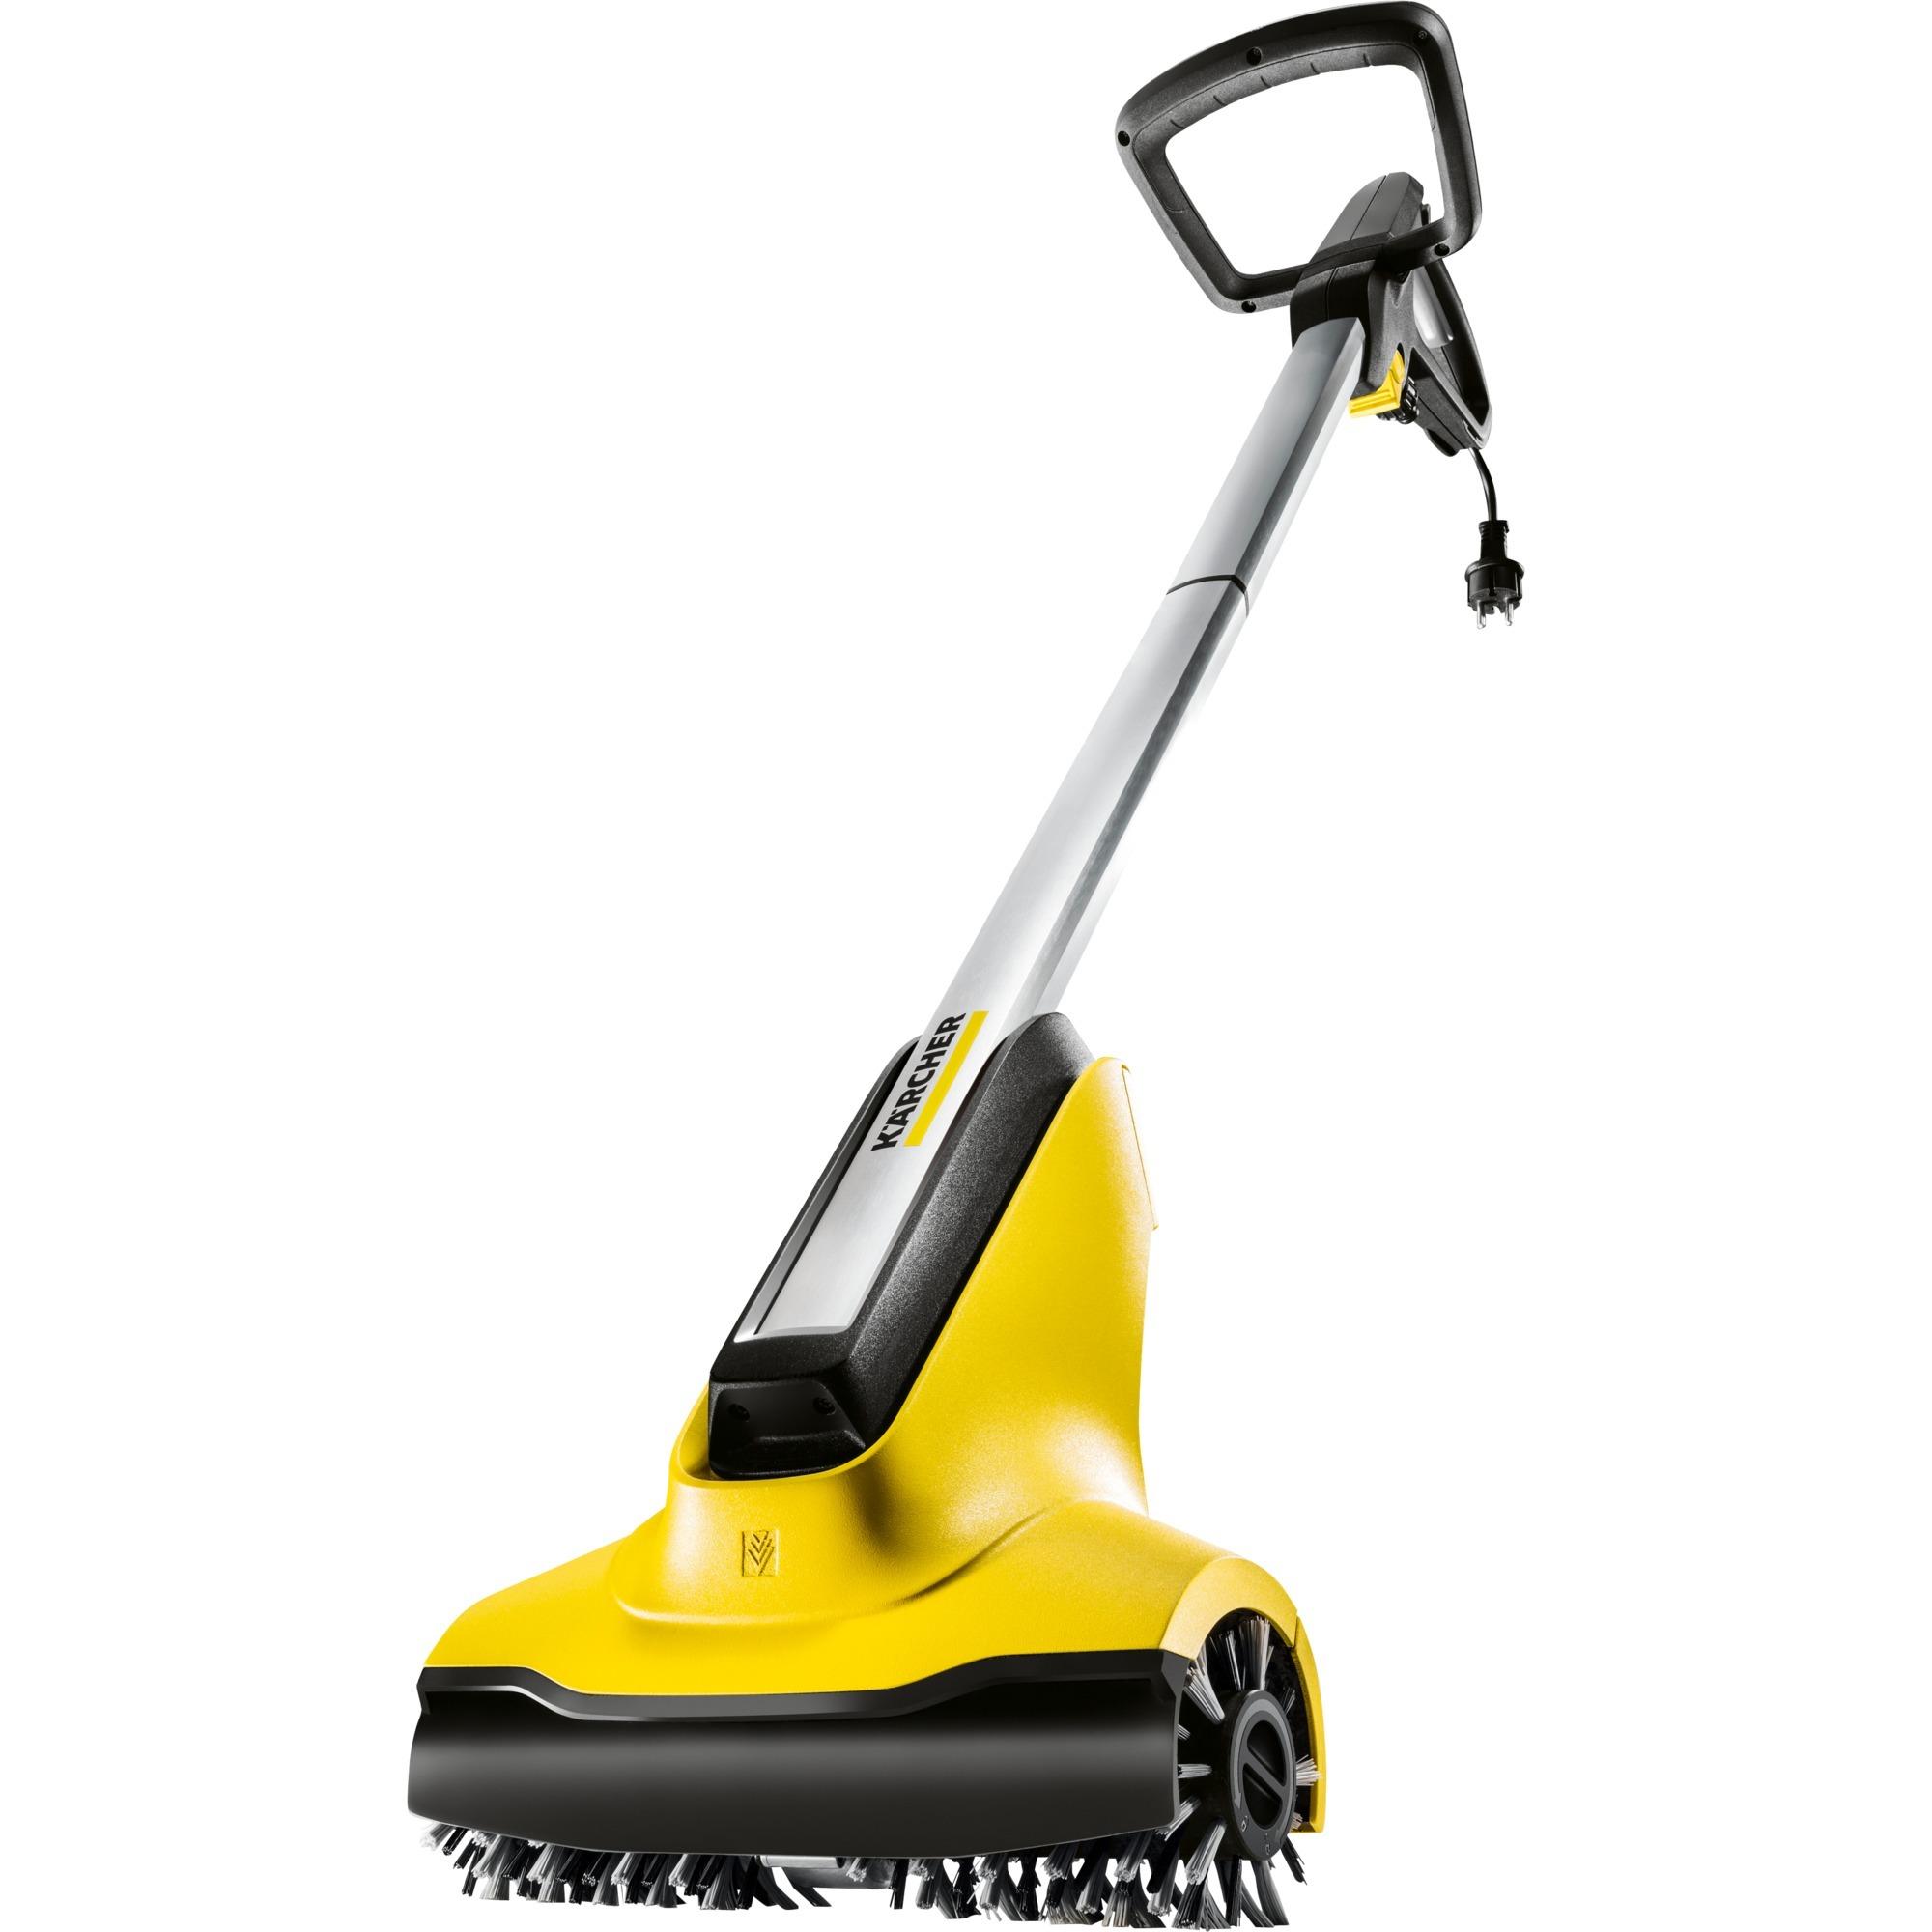 PCL 4 Terassenreiniger pulidor de suelo Negro, Amarillo 800 RPM, Máquinas barredoras